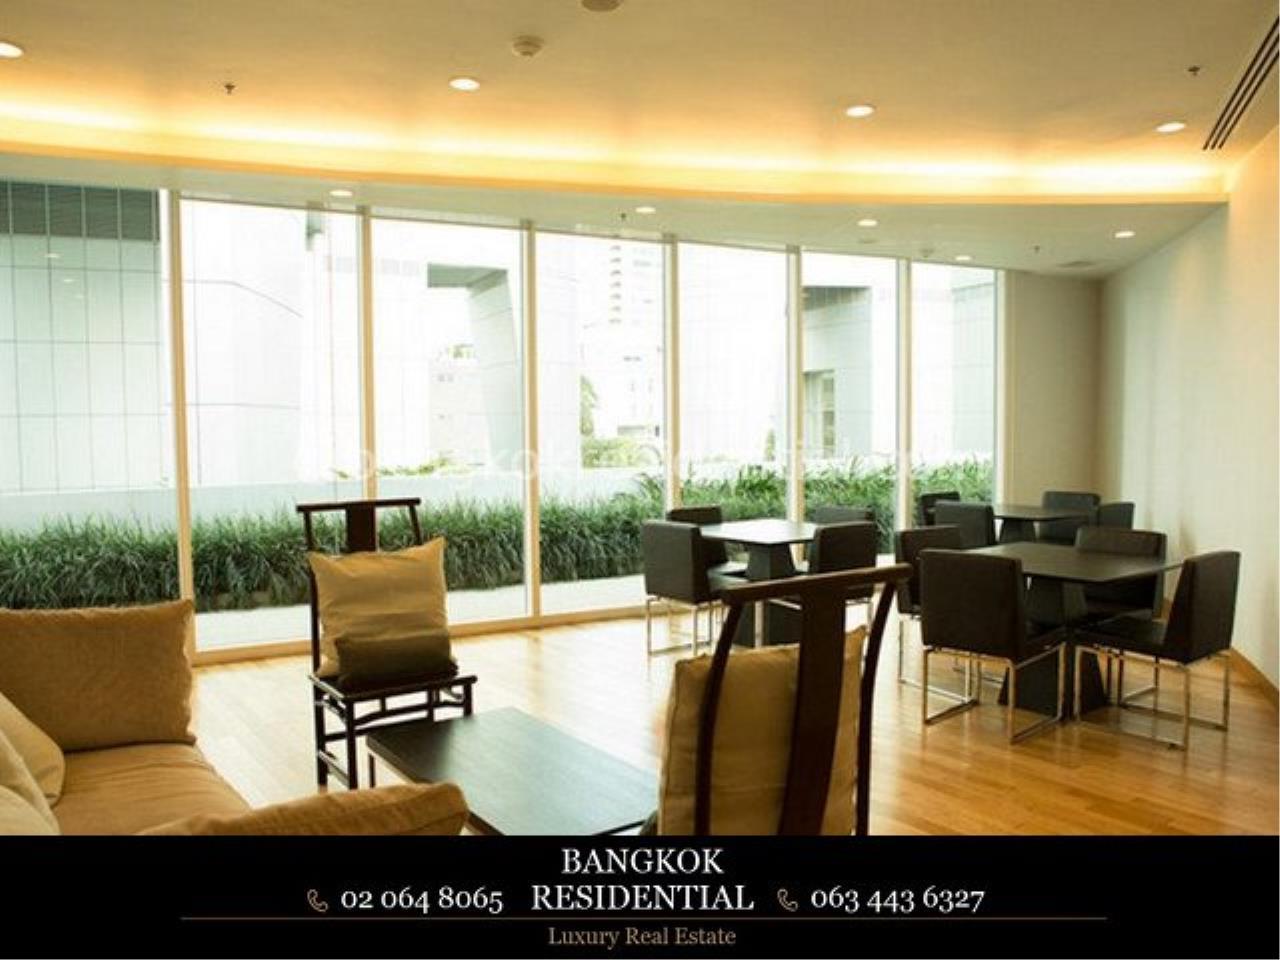 Bangkok Residential Agency's 2BR Millennium Residence For Sale Or Rent (BR1641CD) 12